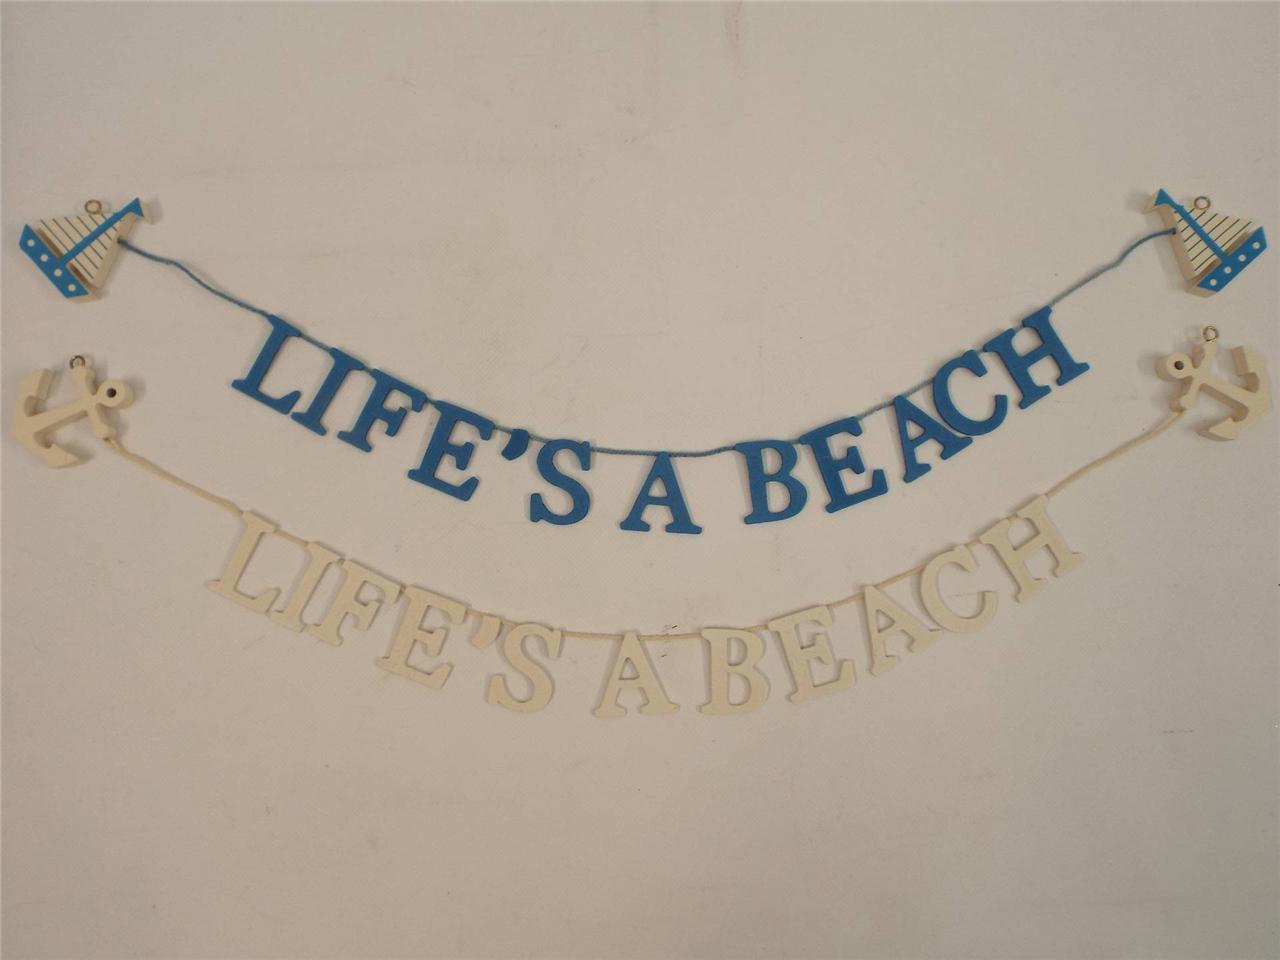 LIFES-A-BEACH-BLUE-GARLAND-NAUTICAL-BEACH-BATHROOM-HOME-DECORATIVE-DECOR-SEA